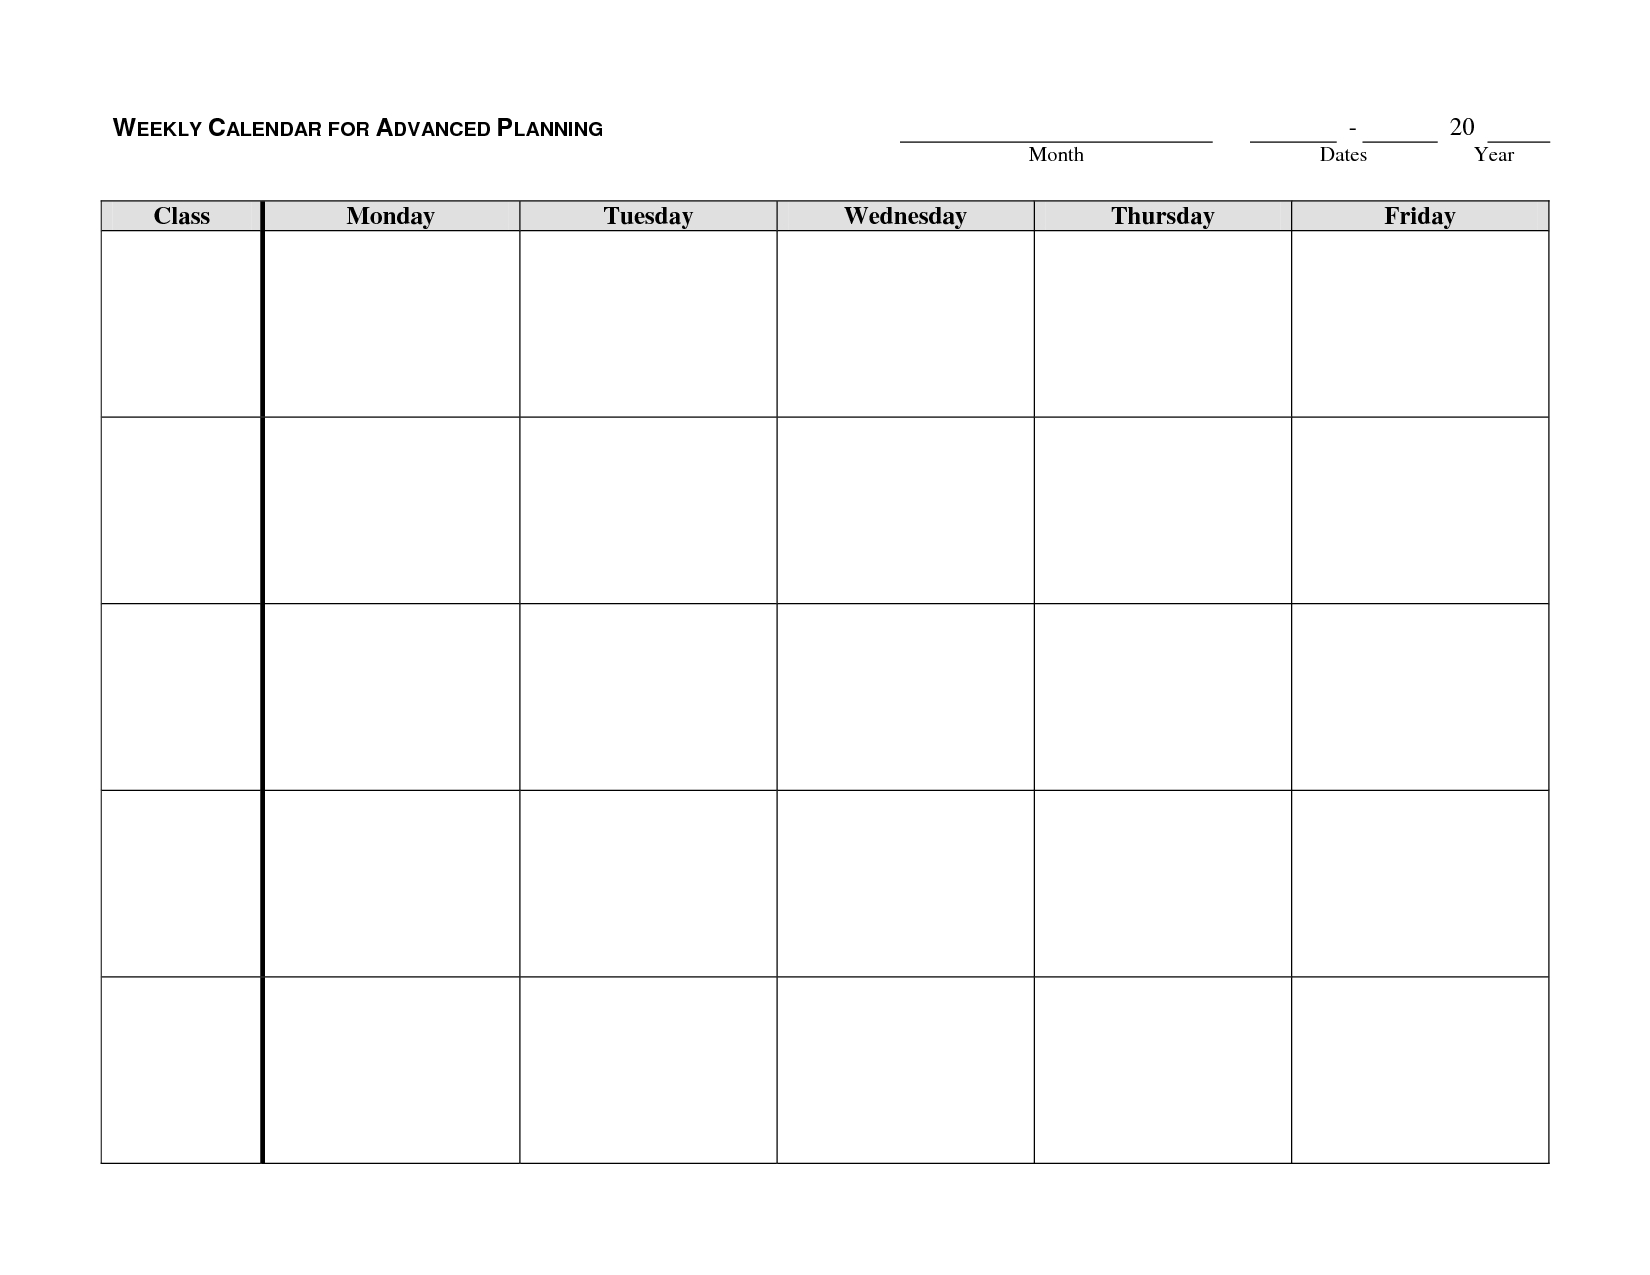 Weekly Calendar Template - Google Search | Autism/school